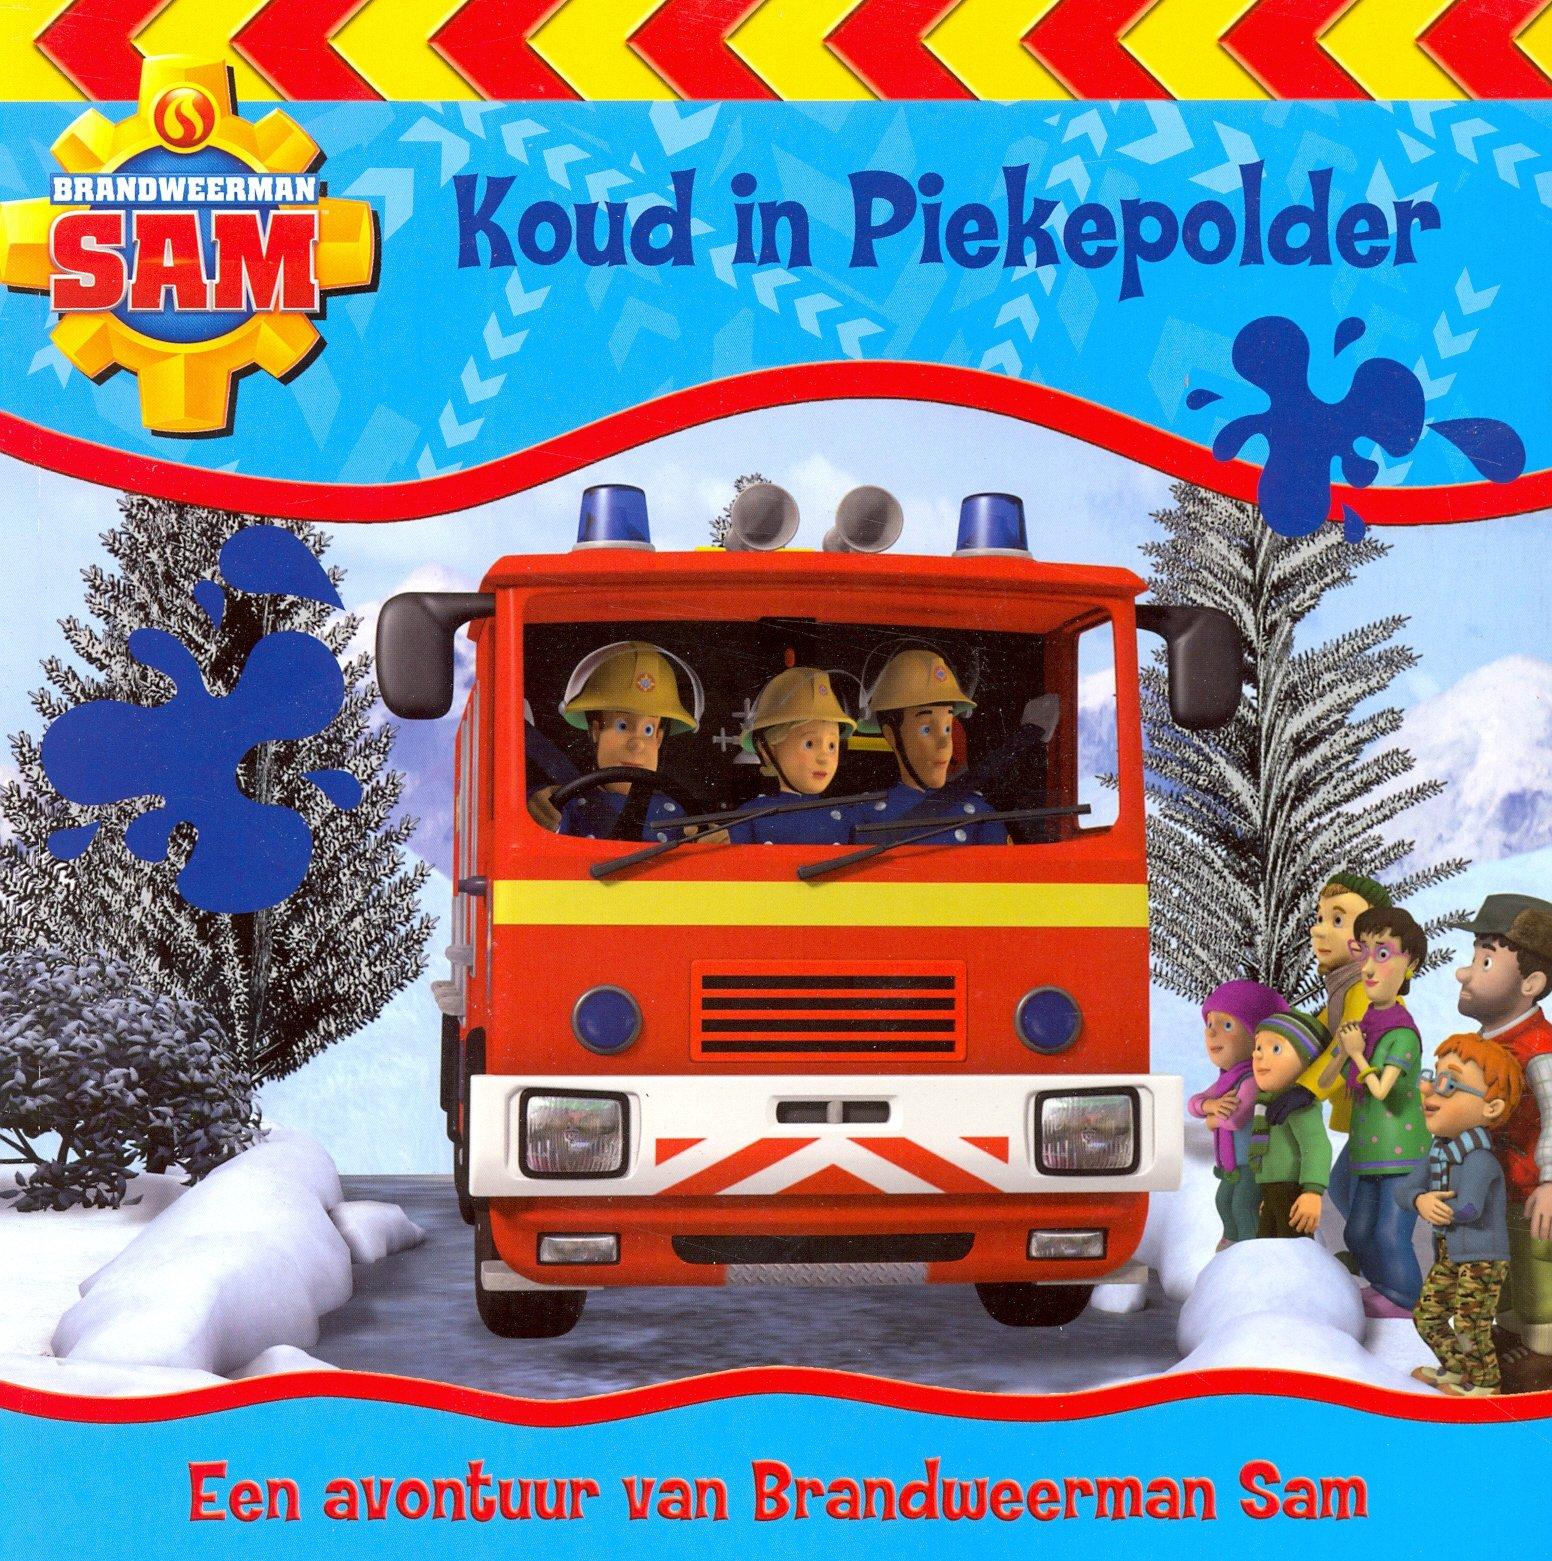 Brandweerman Sam Koud In Piekepolder